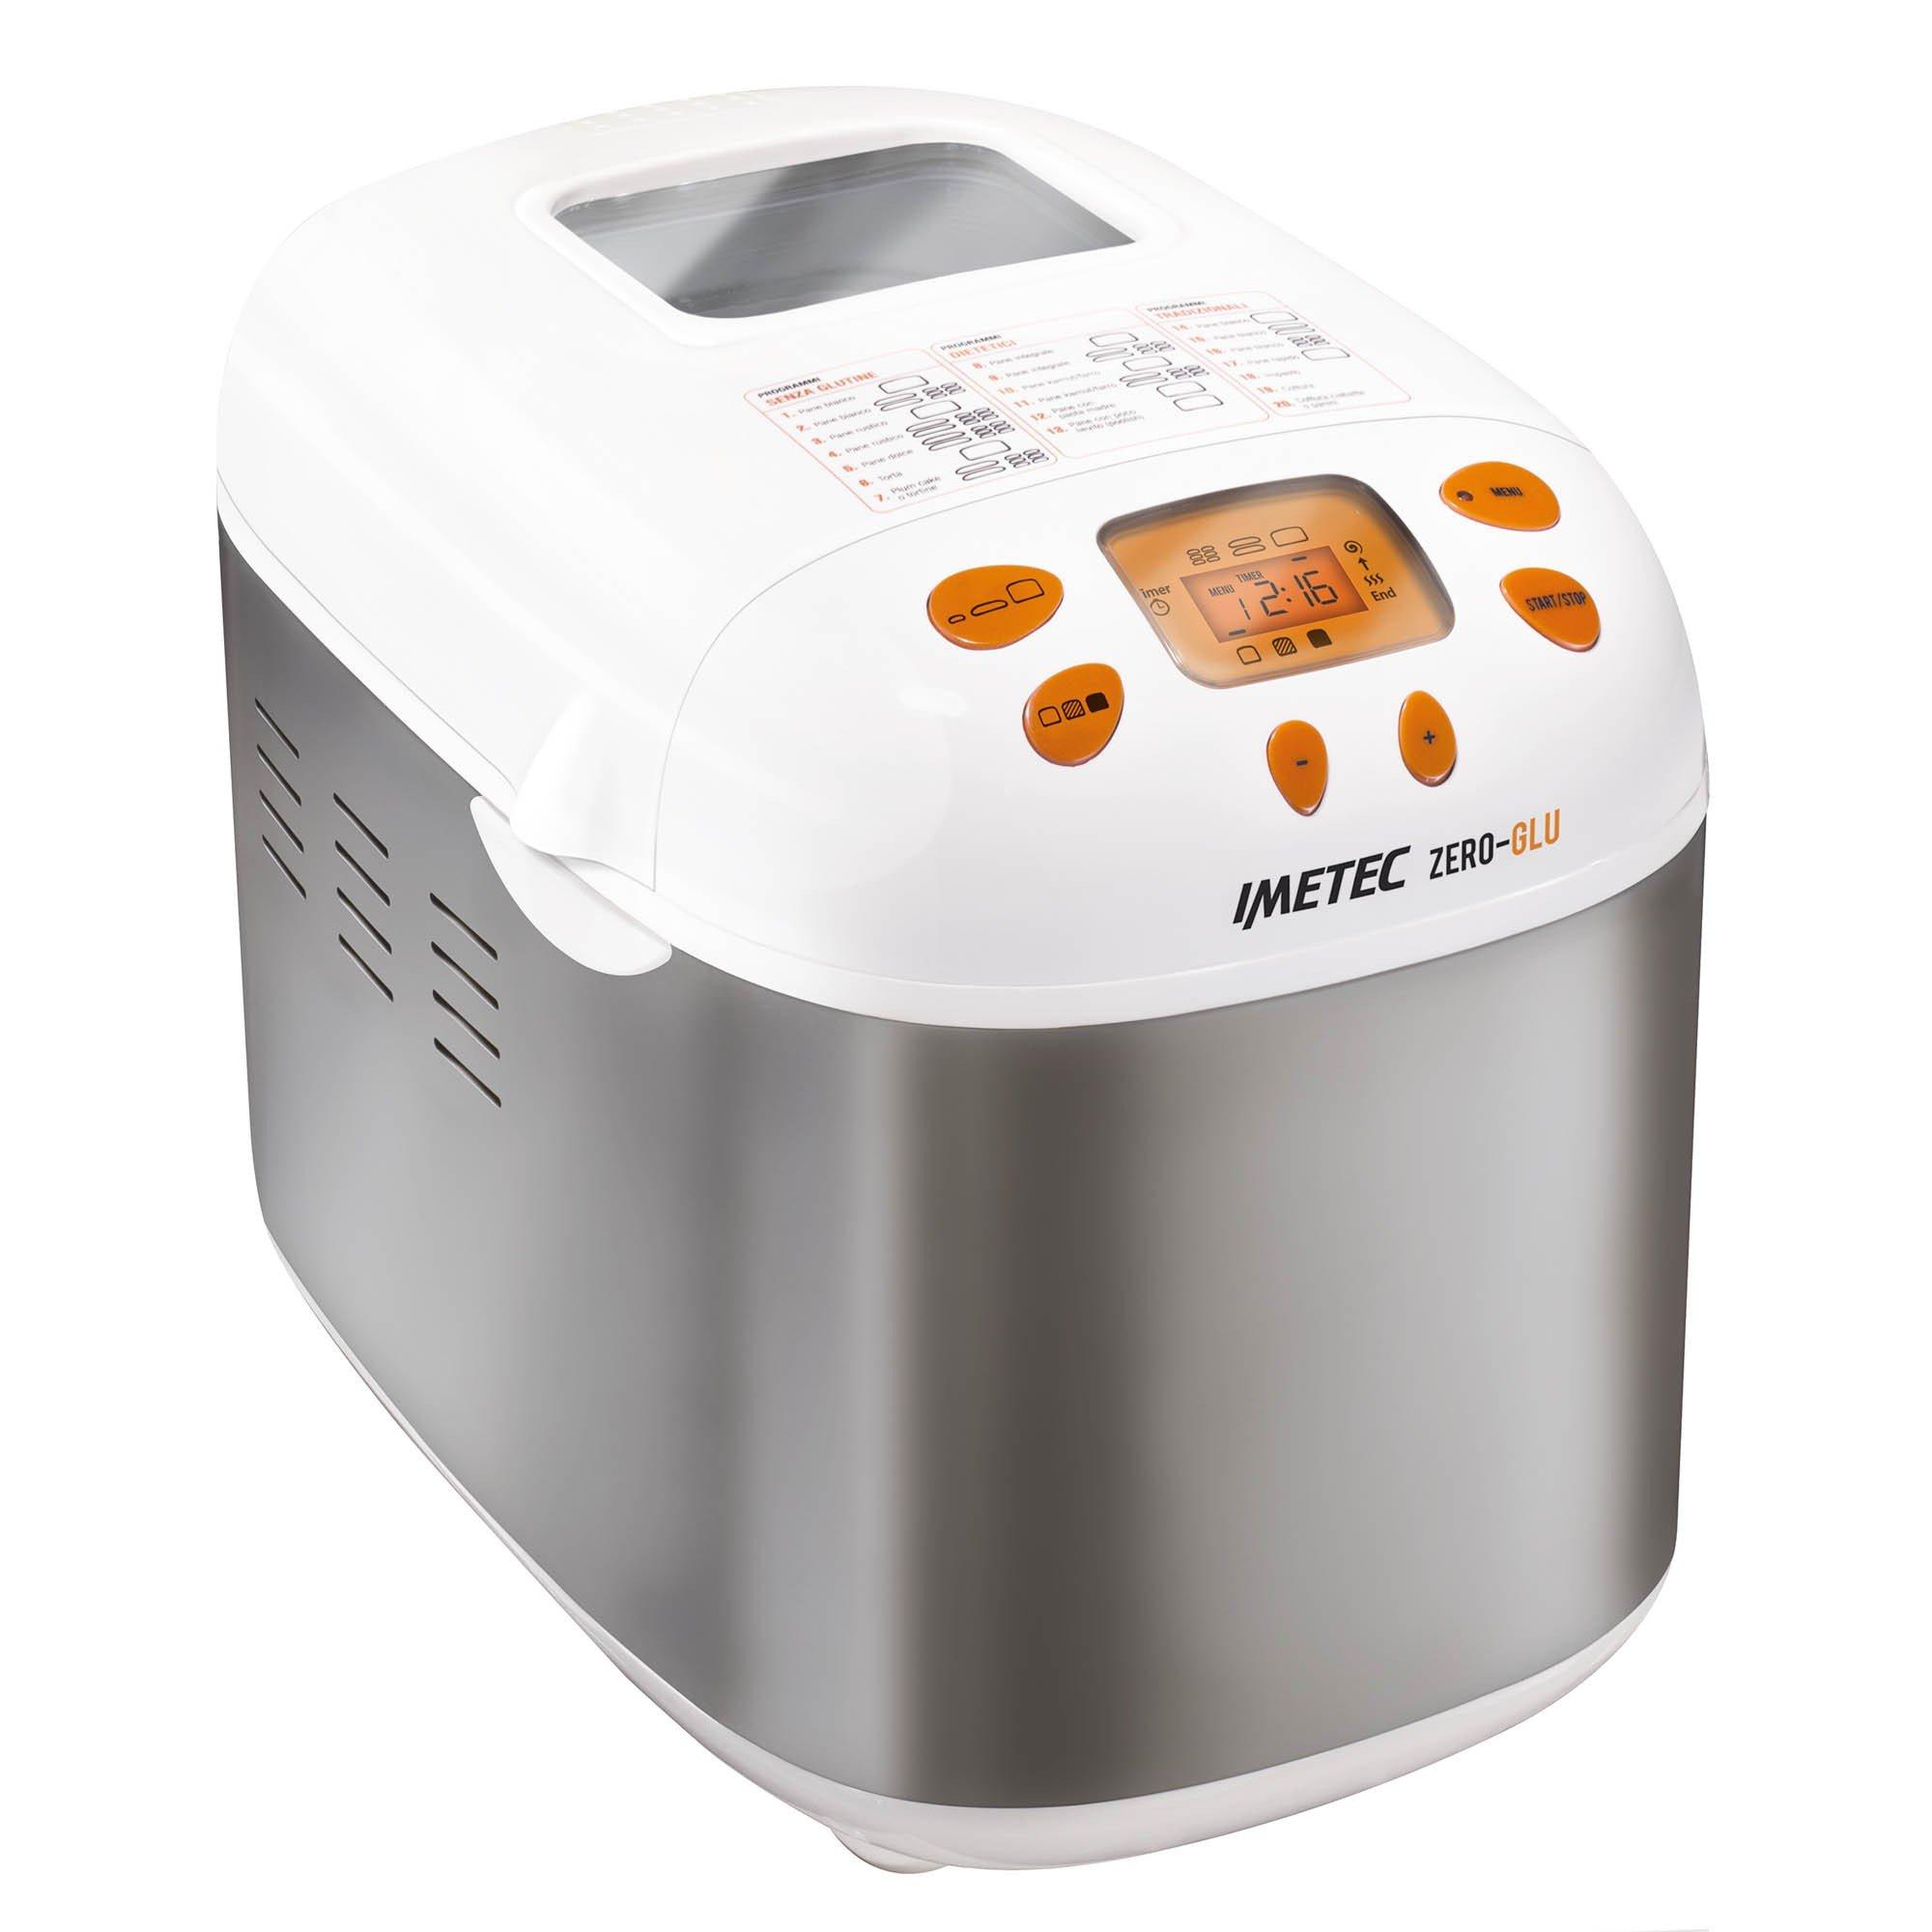 IMETEC Zero Glu Panificadora, 920 W, Blanco y Naranja product image